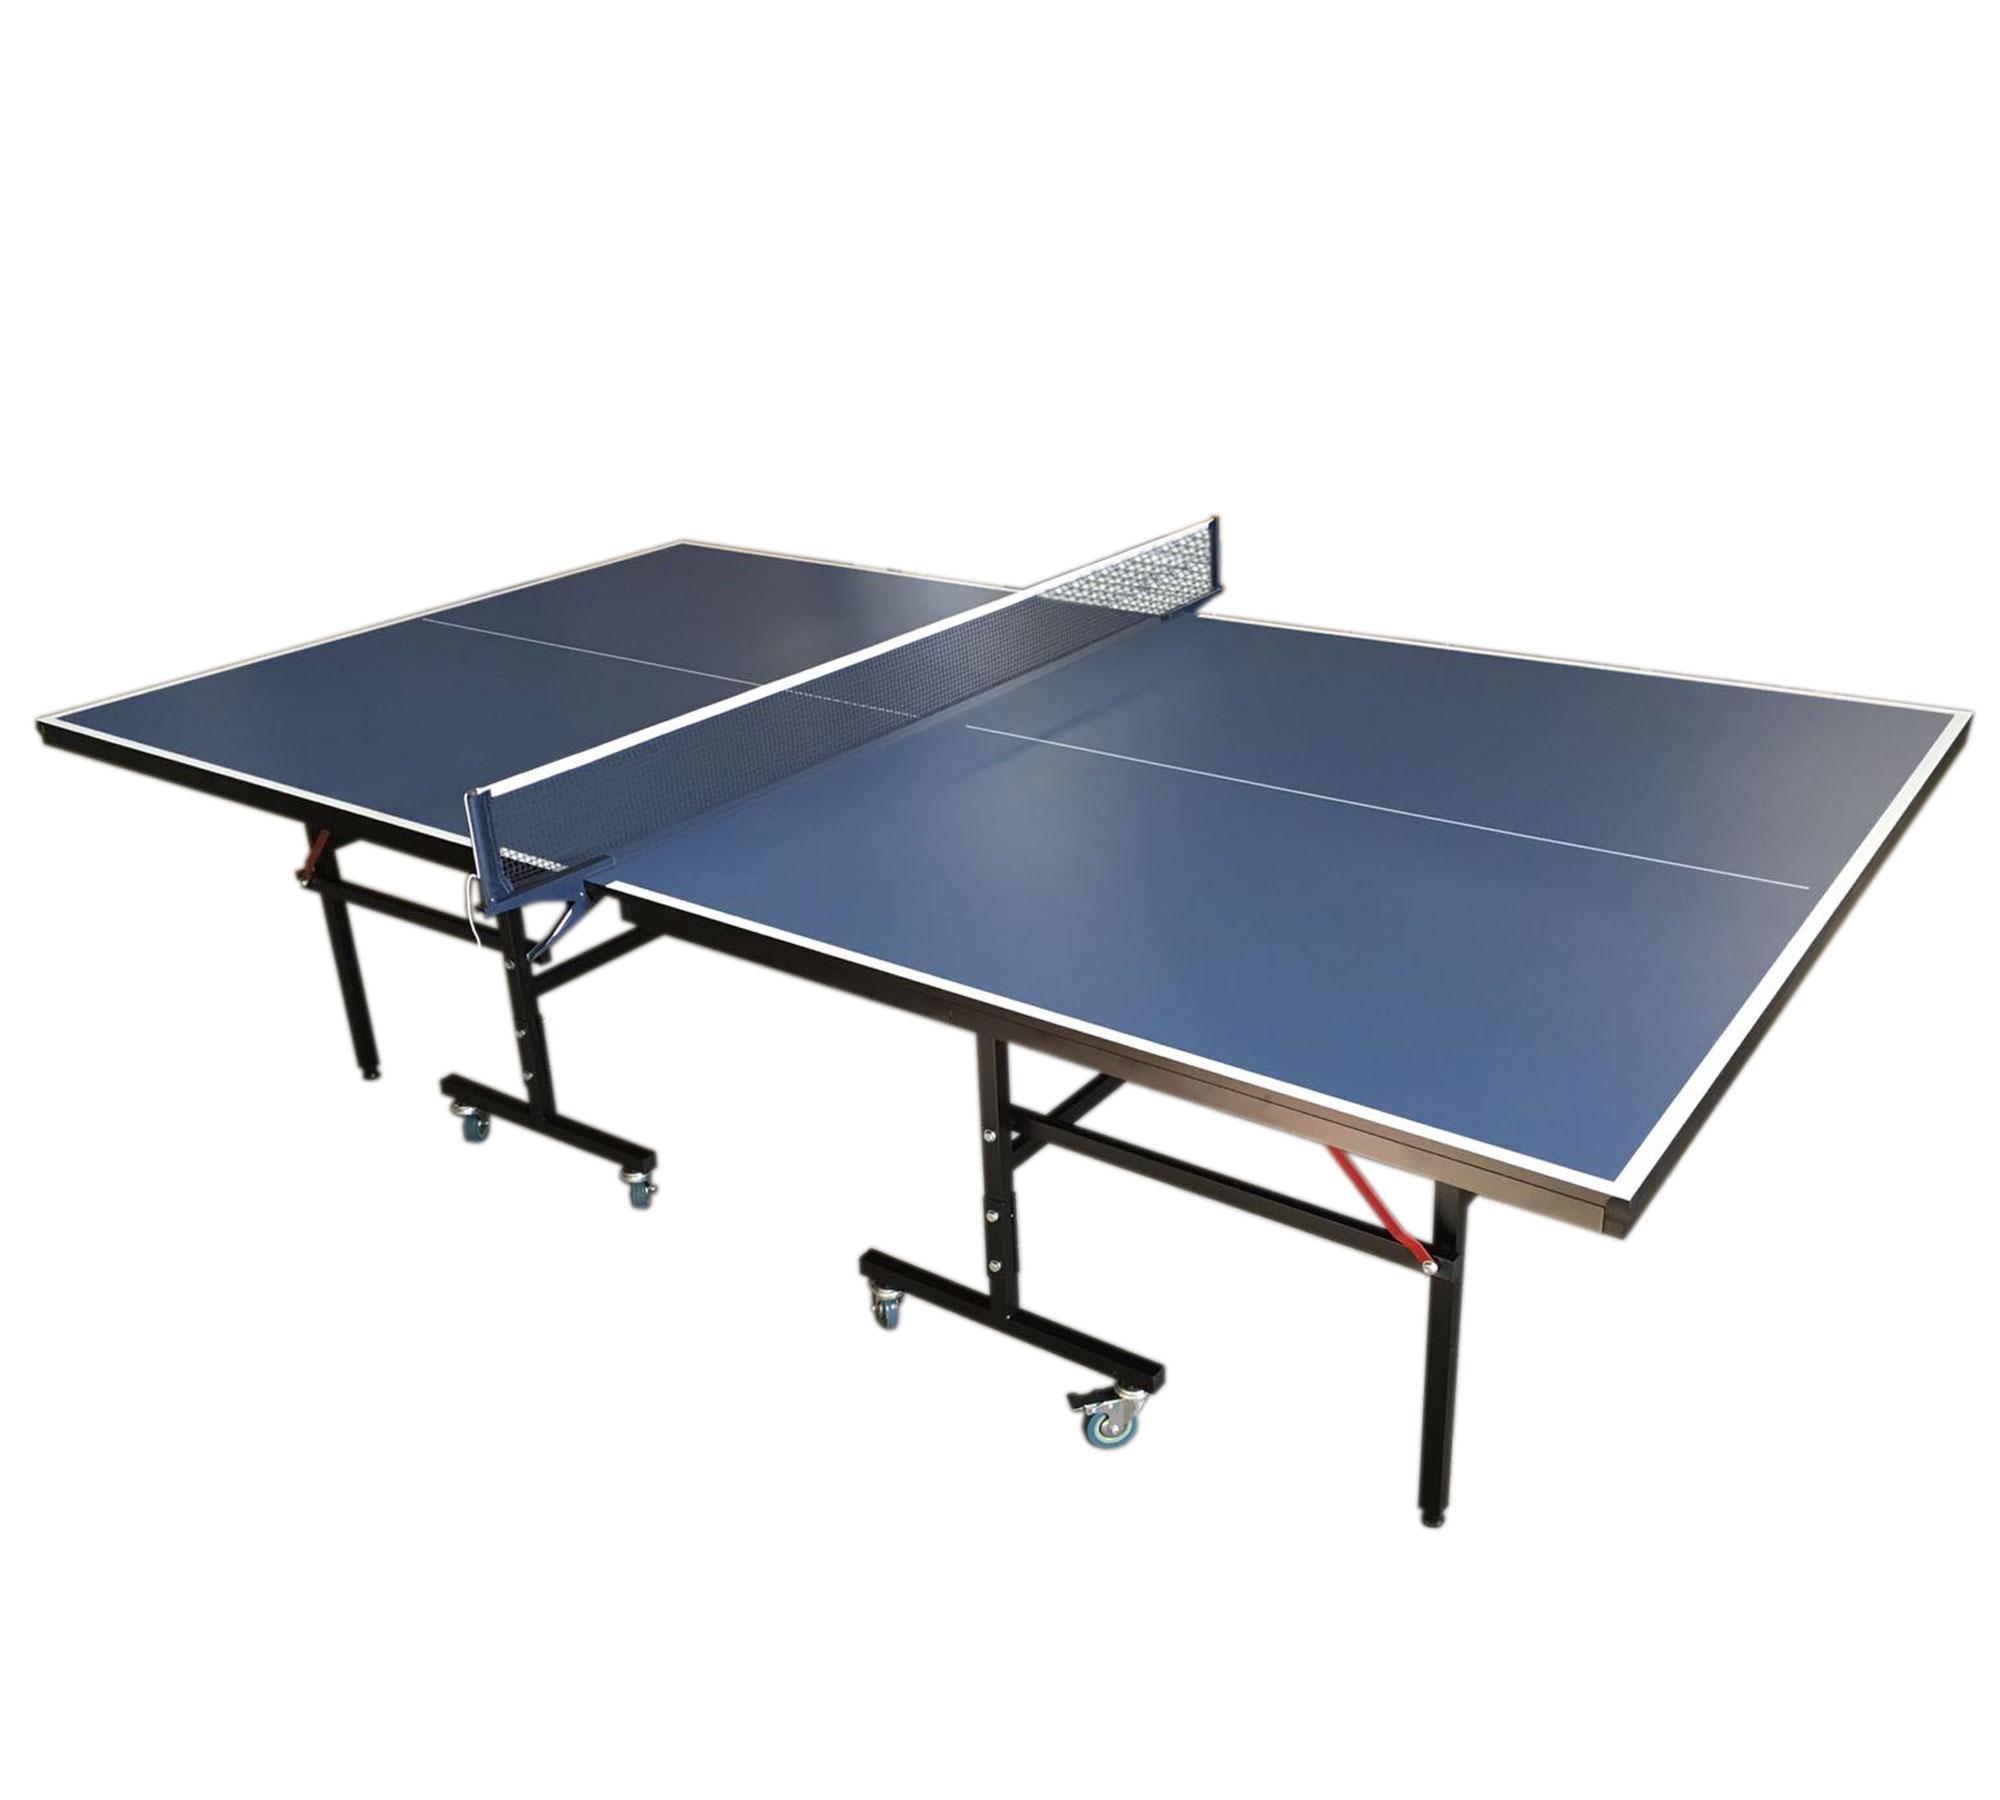 Tavolo da ping pong professionale roby pieghevole - Tavolo da ping pong professionale ...